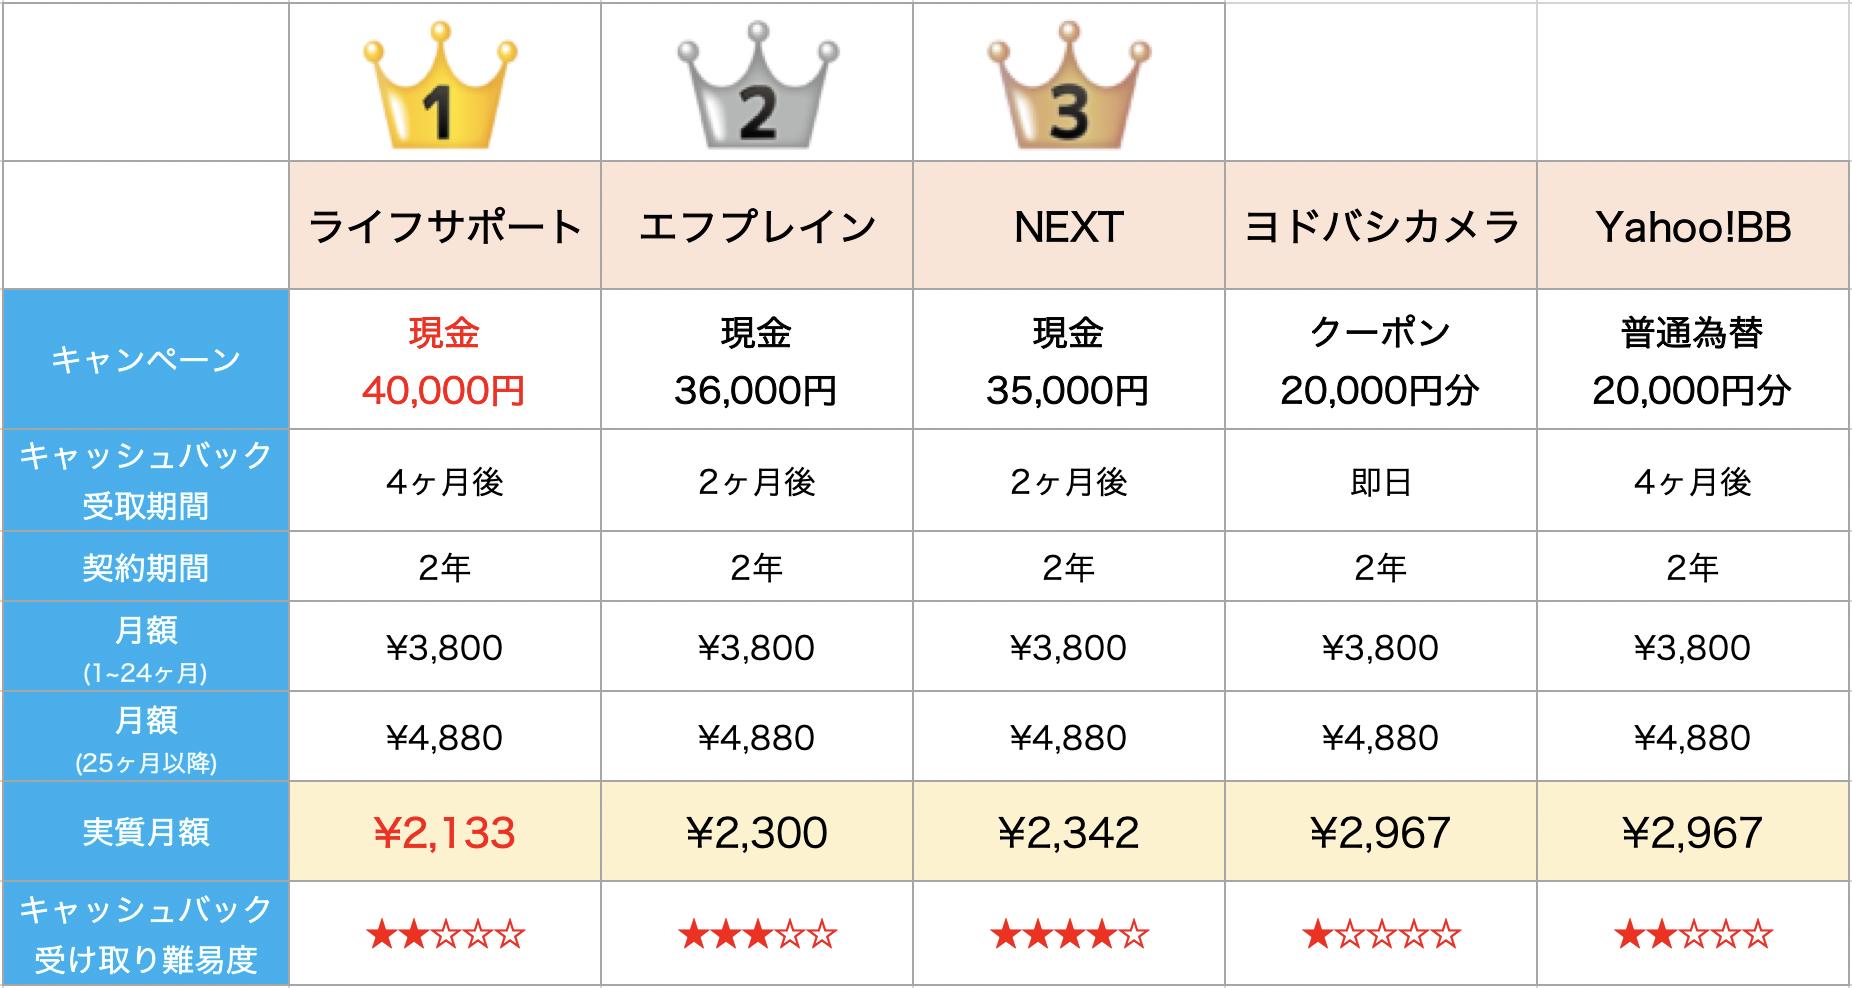 SoftBankAir-shop-ranking